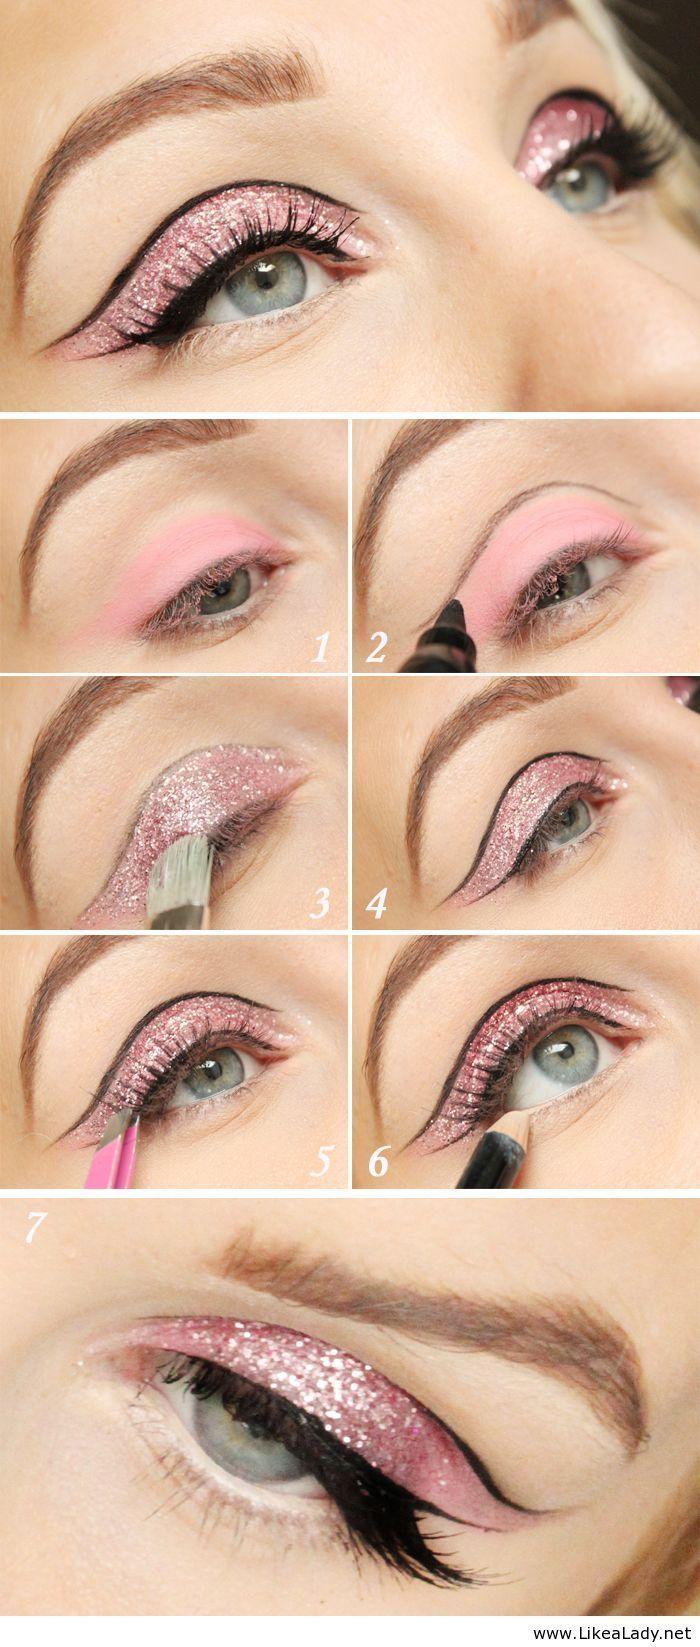 Pink Glitter CatEye in Motives Eye Shadow(Heiress), Eye Pencil and Glitter Pots(Jewel Pink)! #Jewel #Sparkle #Color